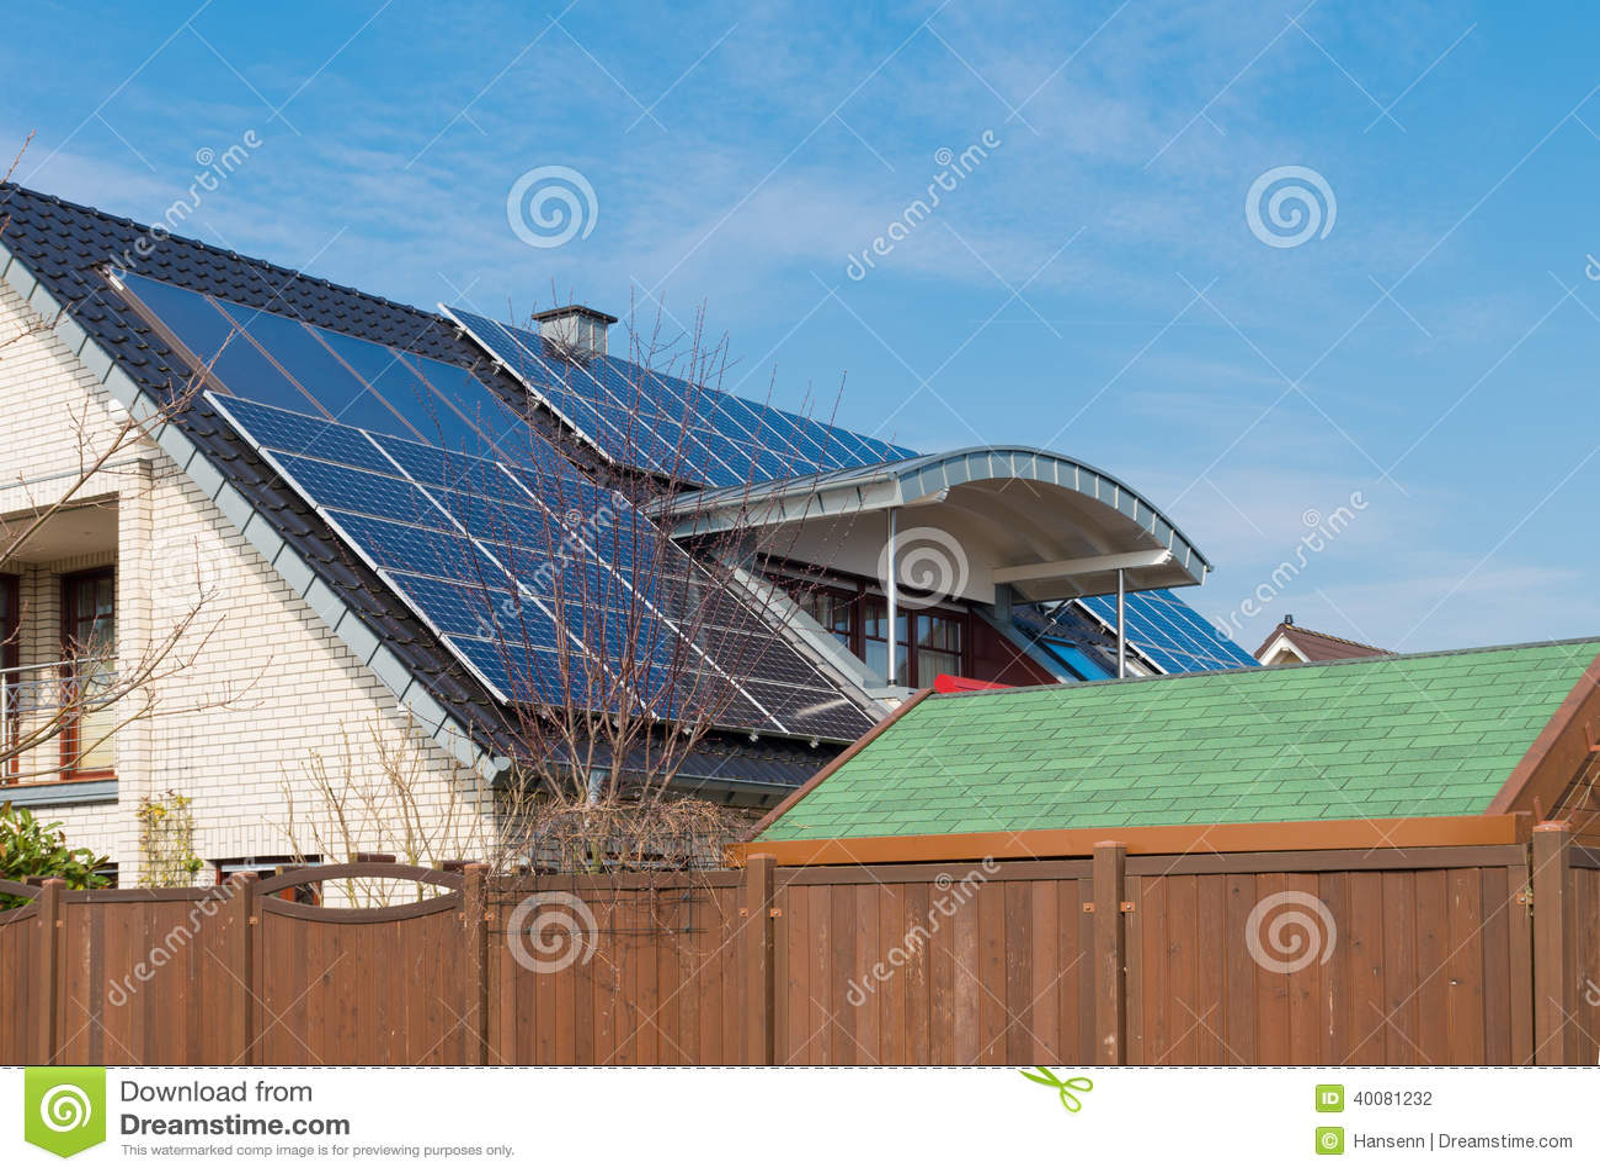 Solar Panels On Roof Stock Photo Image 40081232